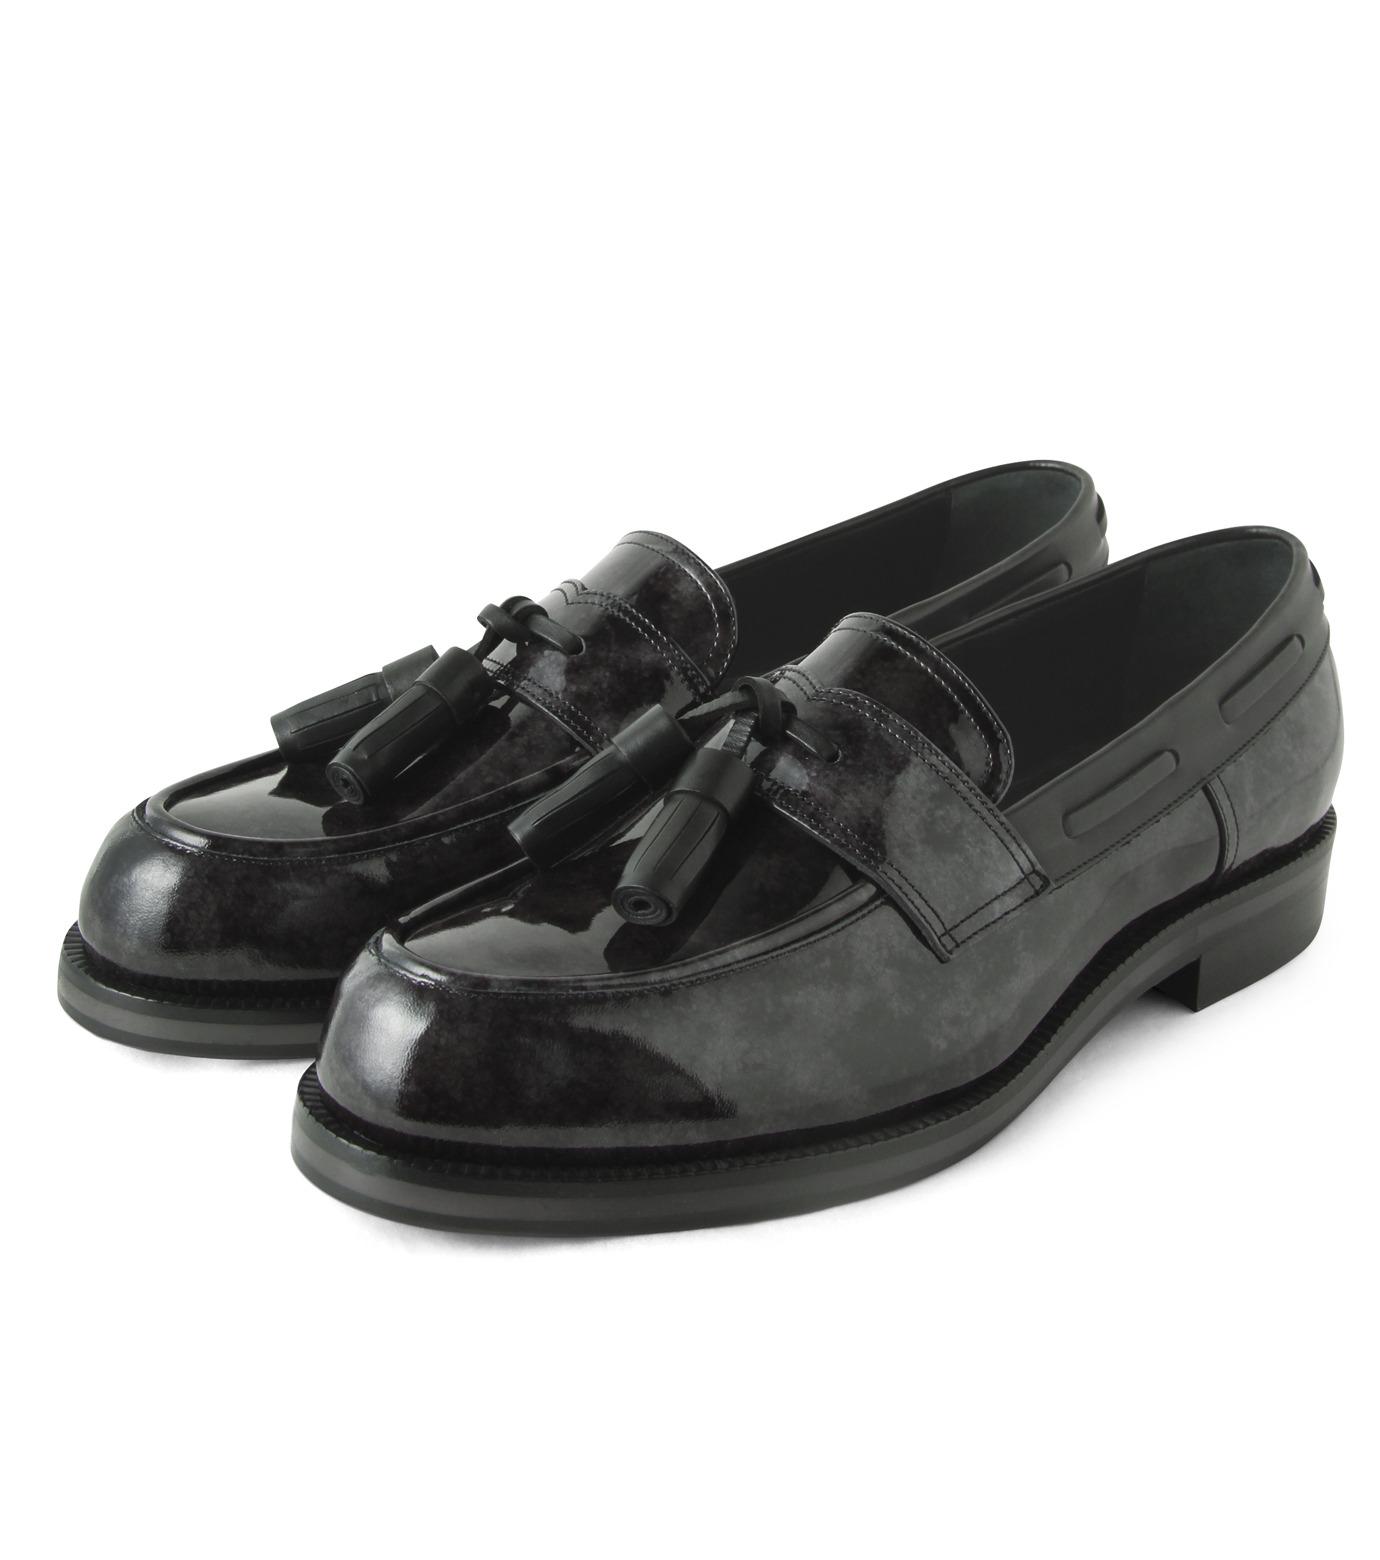 Jimmy Choo(ジミーチュウ)のMarble Patent-BLACK(シューズ/shoes)-NATHAN-MBP-13 拡大詳細画像3